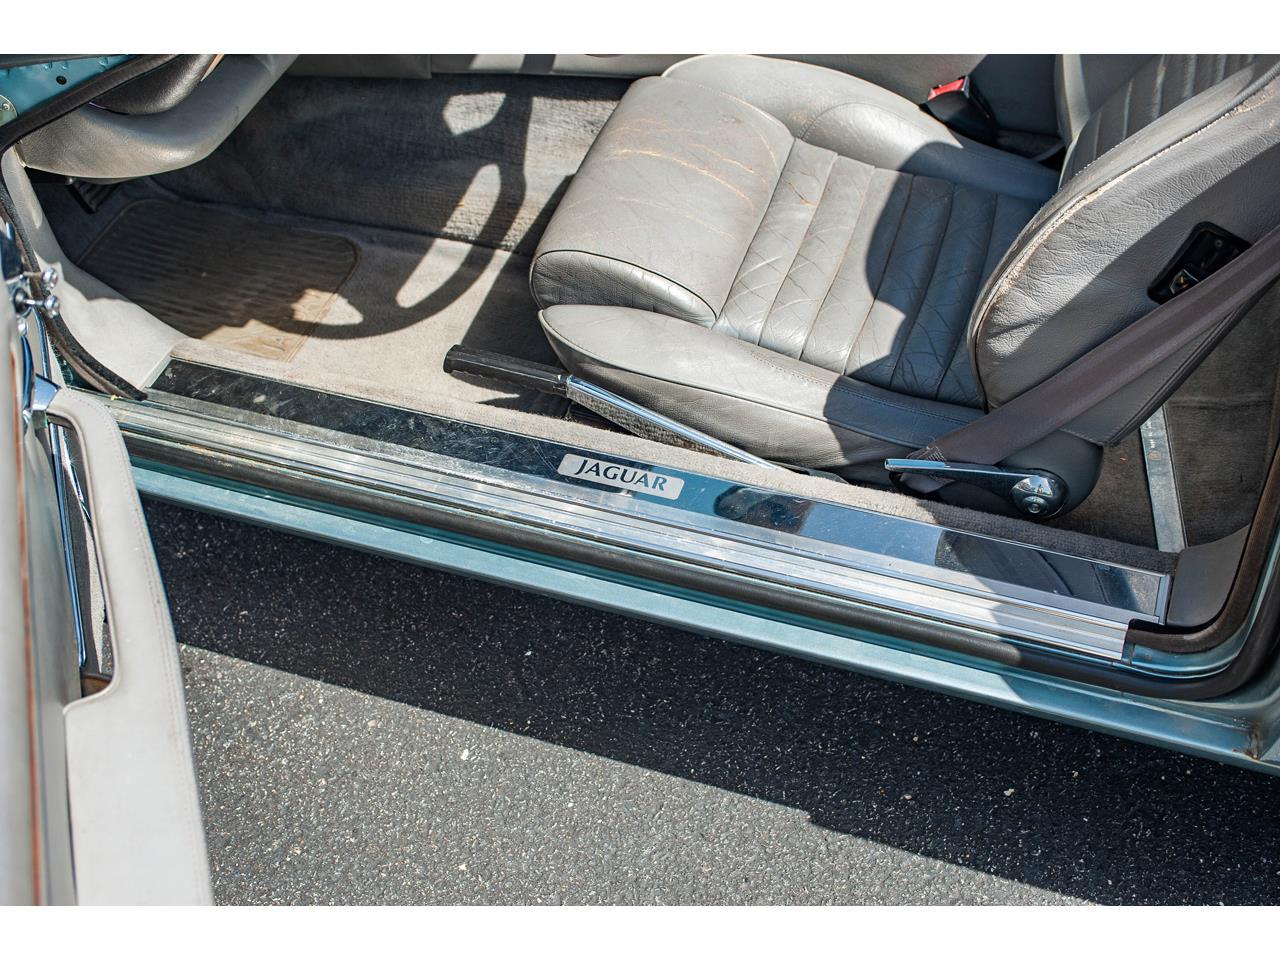 Large Picture of 1990 Jaguar XJS - $15,500.00 - QB9E